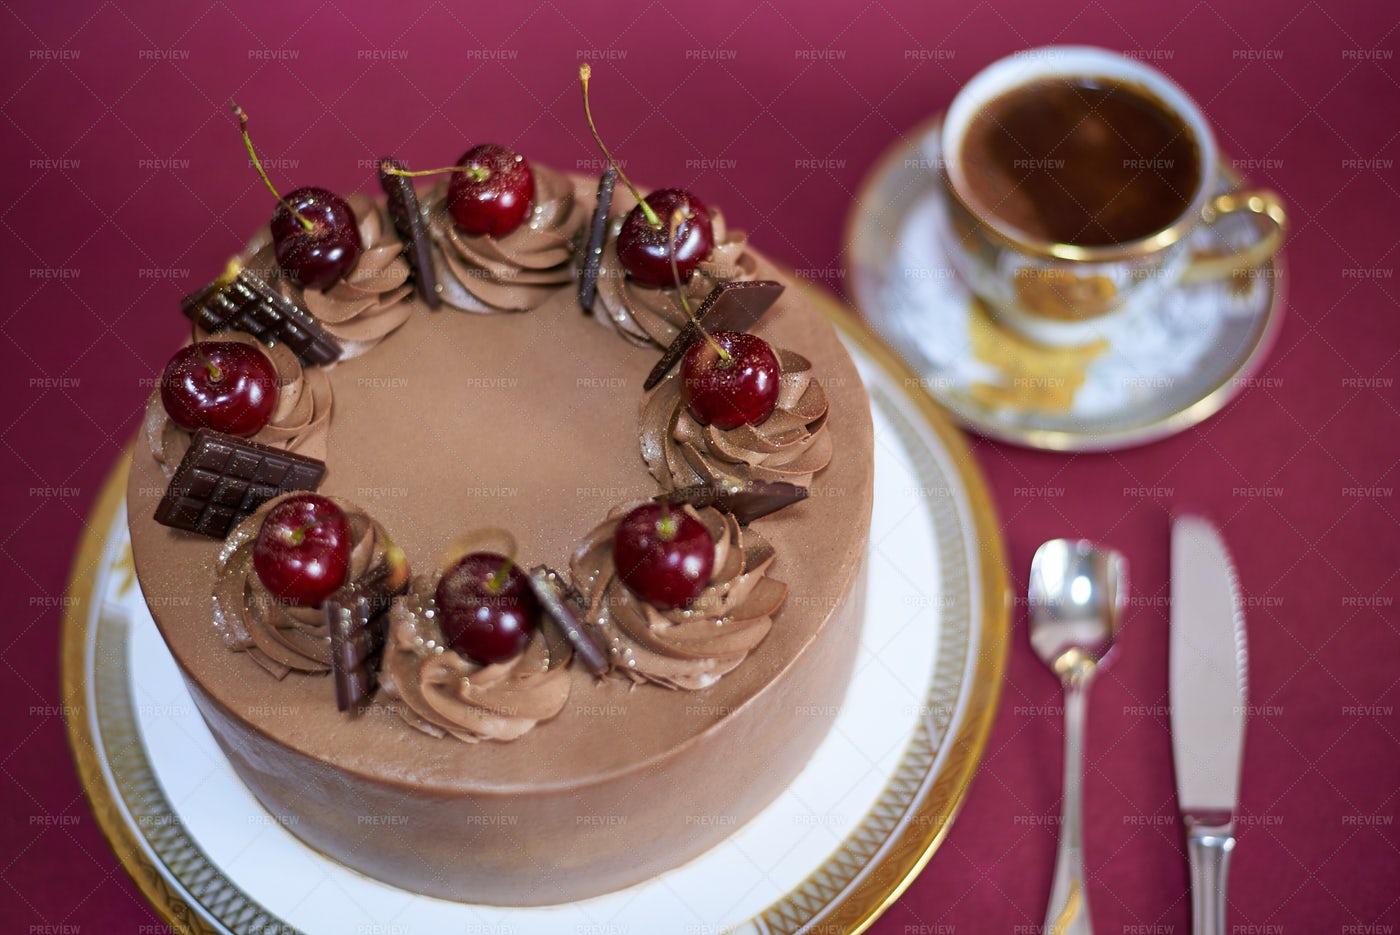 Cake And Coffee.: Stock Photos